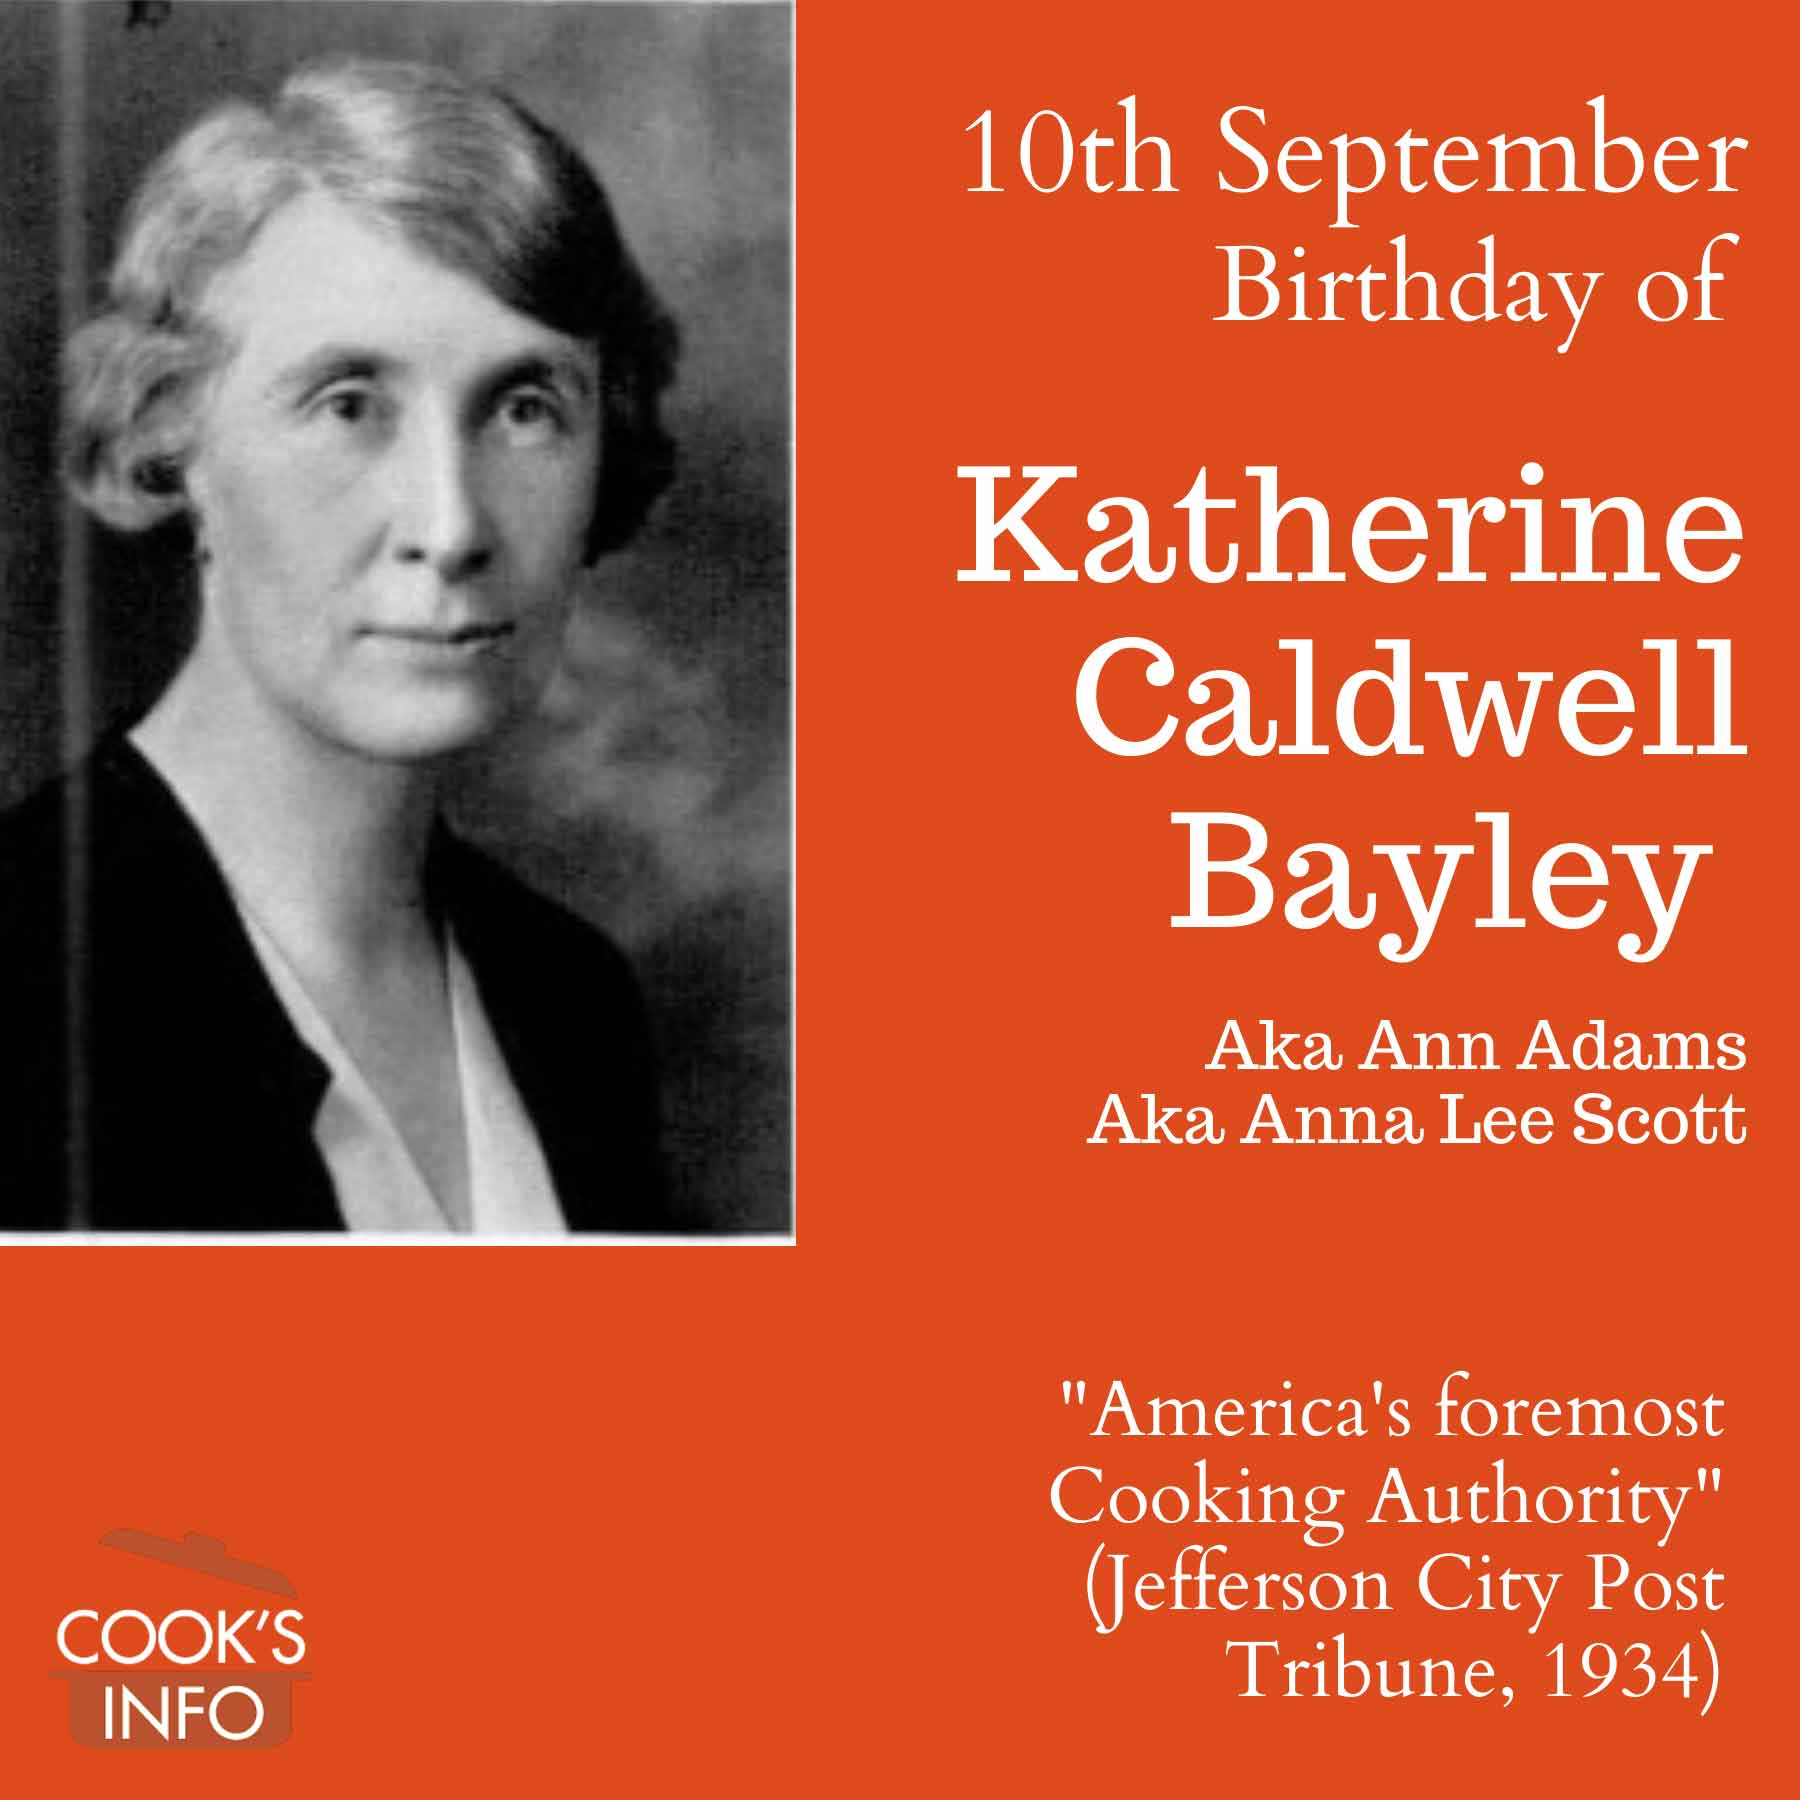 Katherine Caldwell Bayley birthday